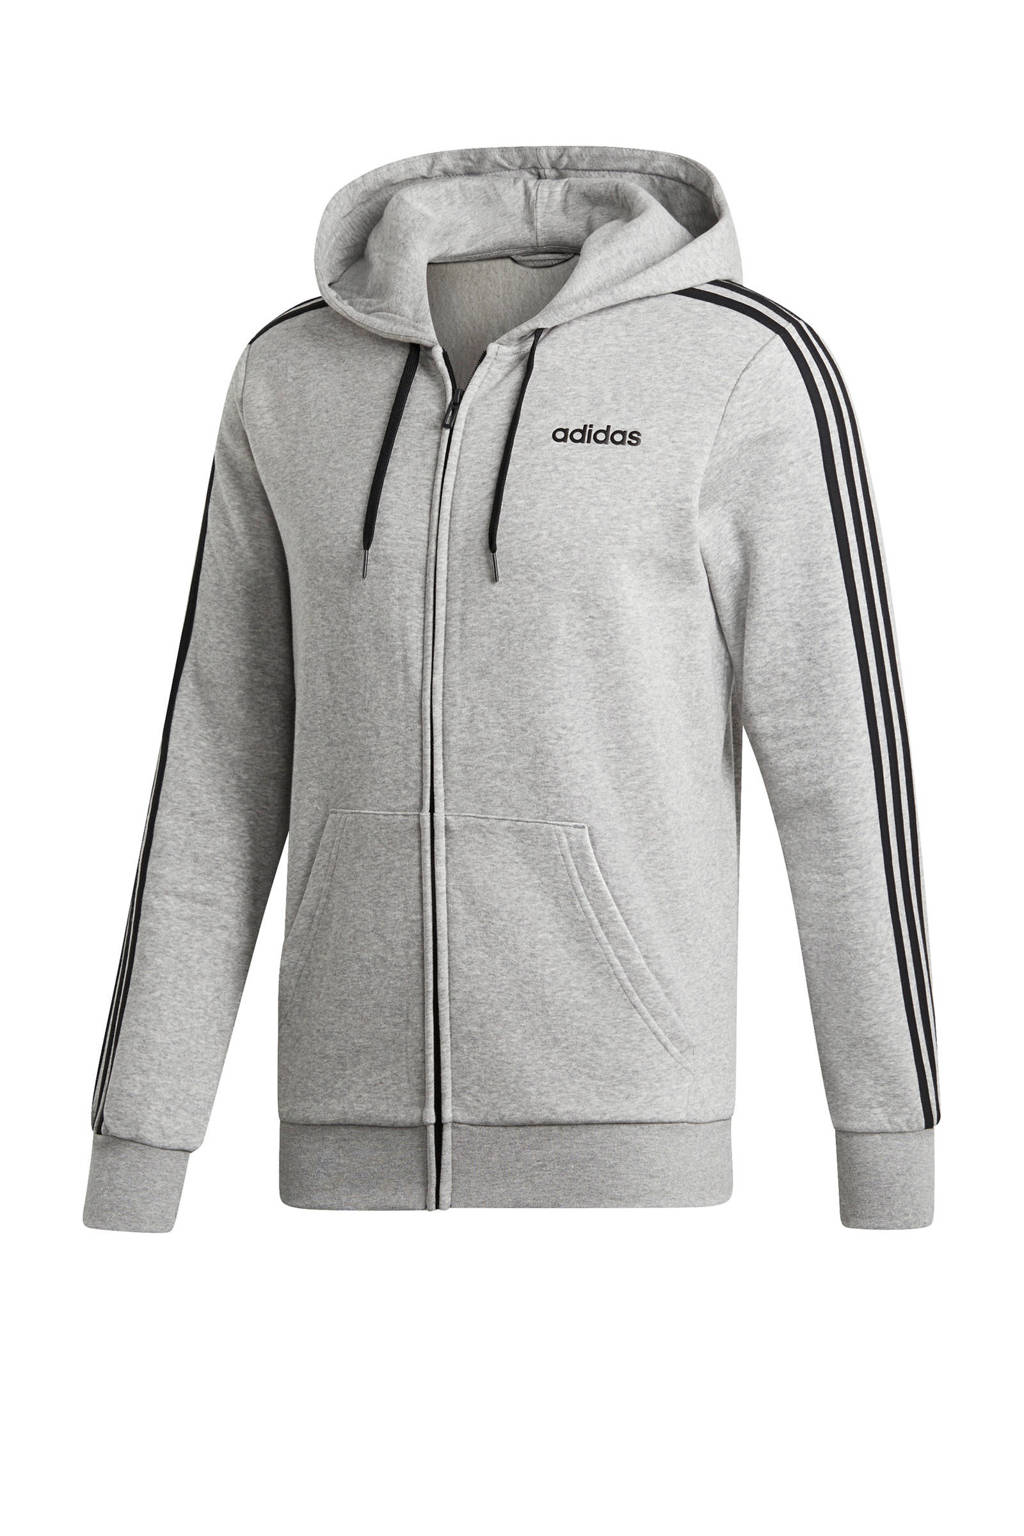 adidas performance   sportvest grijs melange, Grijs melange/zwart